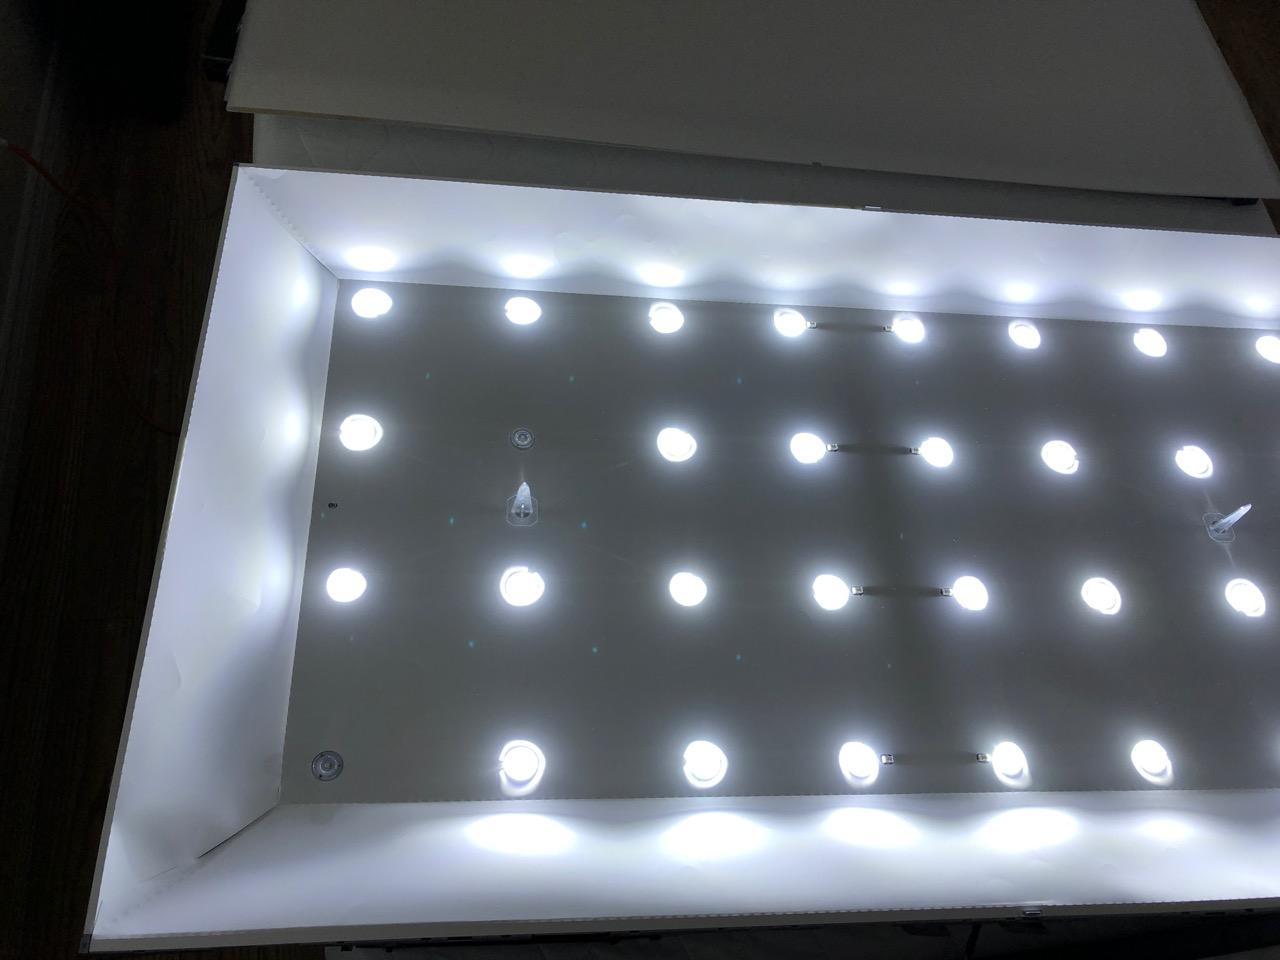 Troubleshooting and Repair of an LCD TV | SaskaPriest